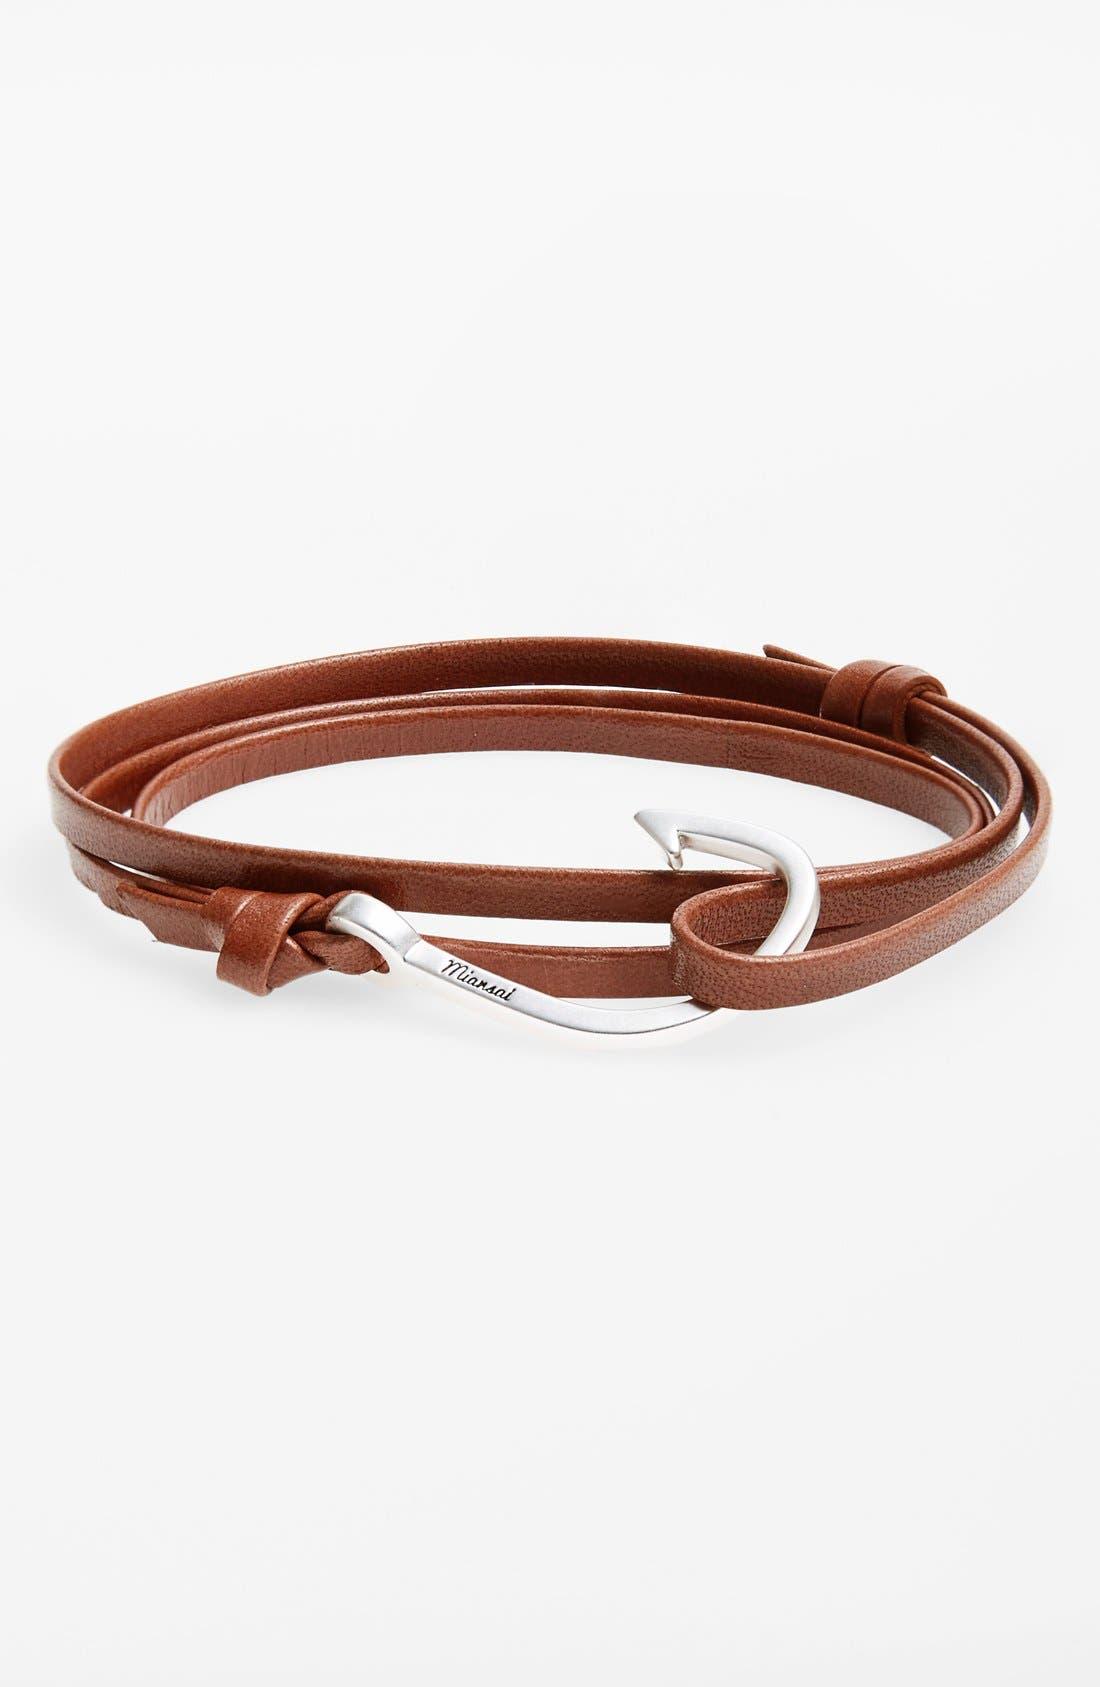 Main Image - Miansai Silver Hook Leather Bracelet